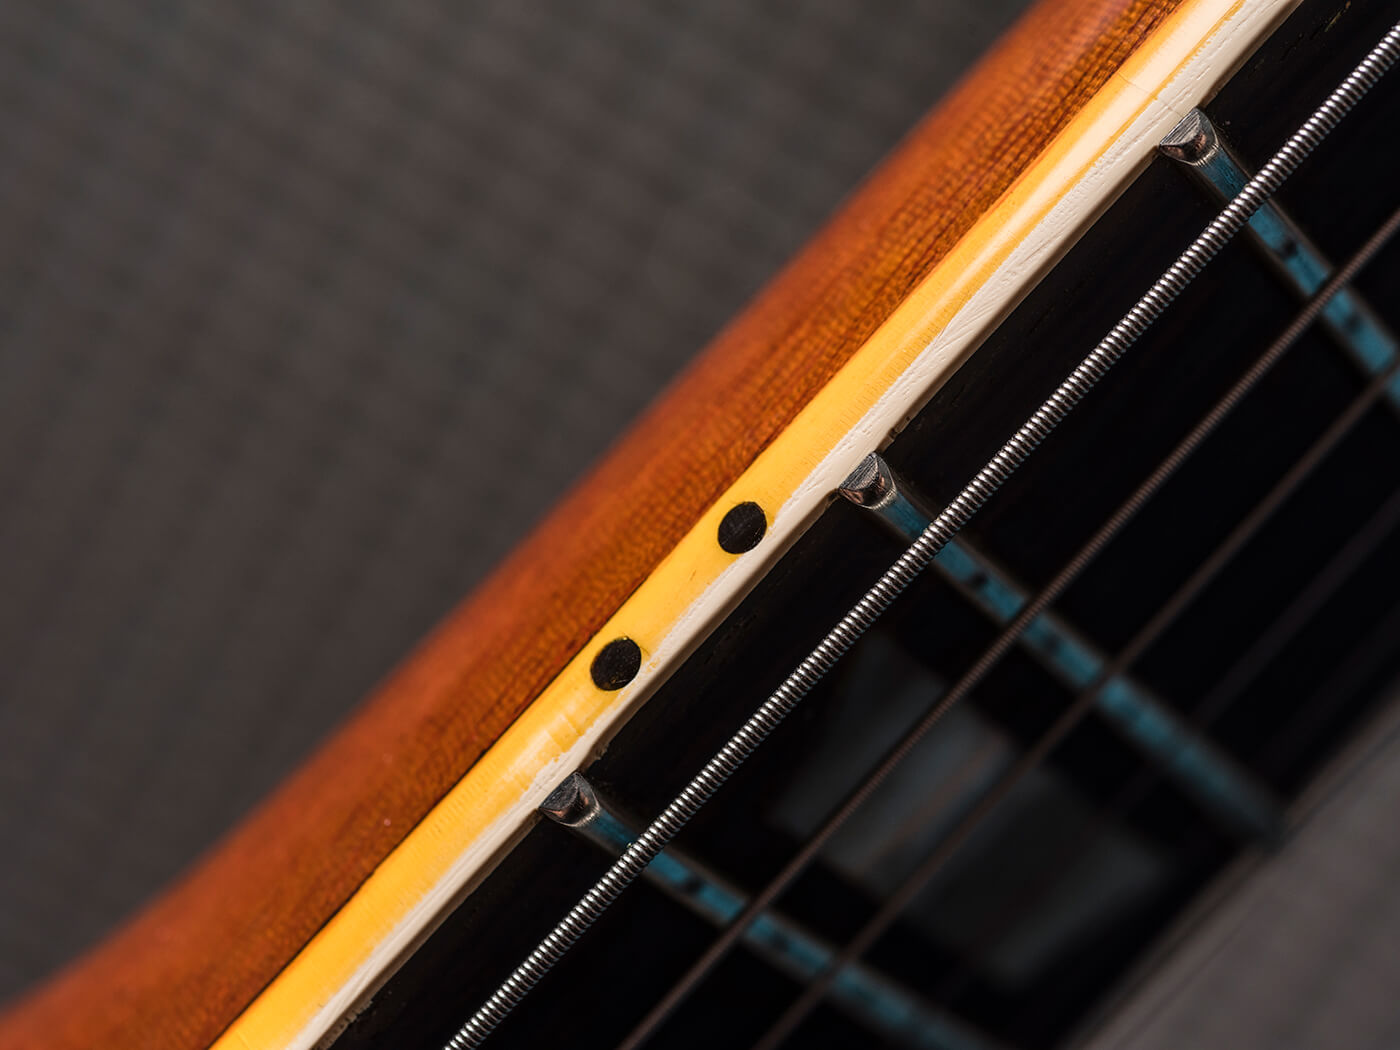 Gary Gand 1960 Gibson Les Paul Standard (Fretboard)